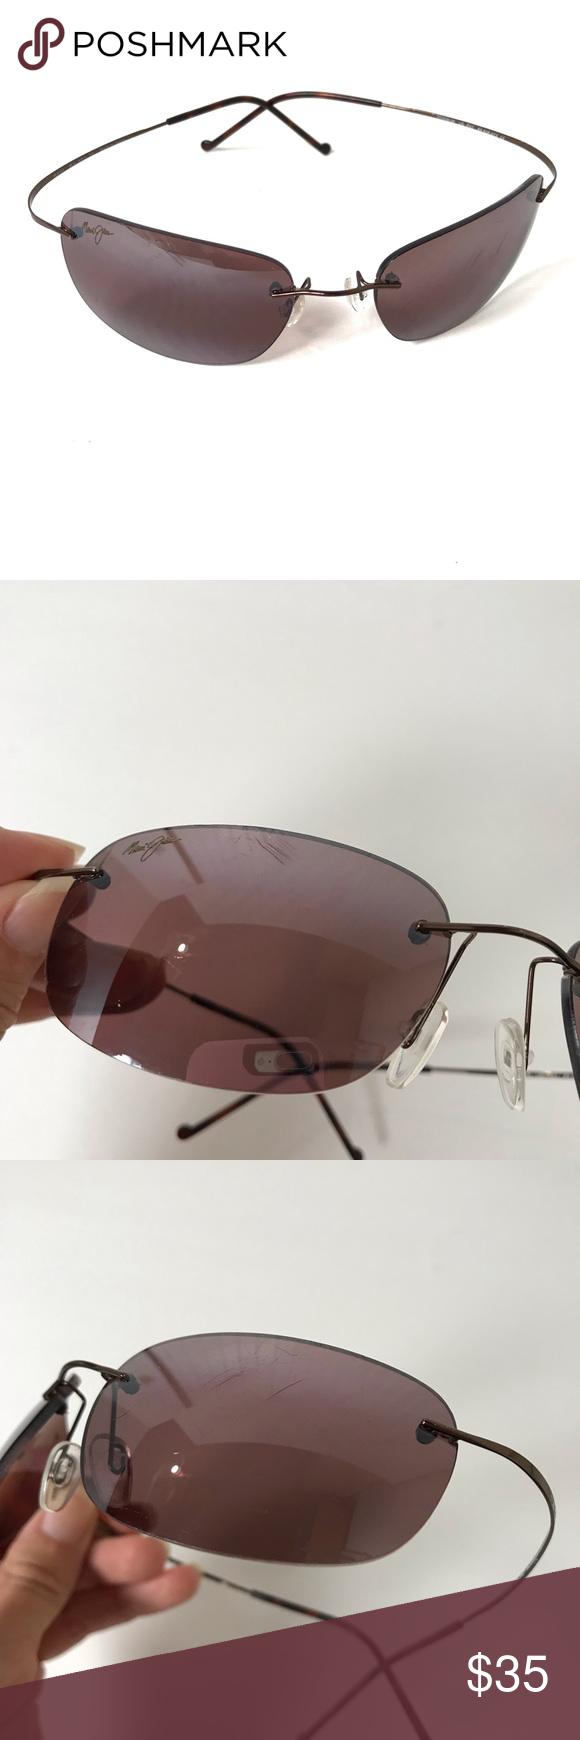 714f67d13eab Maui Jim MJ-502-23 MJ Sport Titanium Sunglasses **PLEASE READ DESCRIPTION